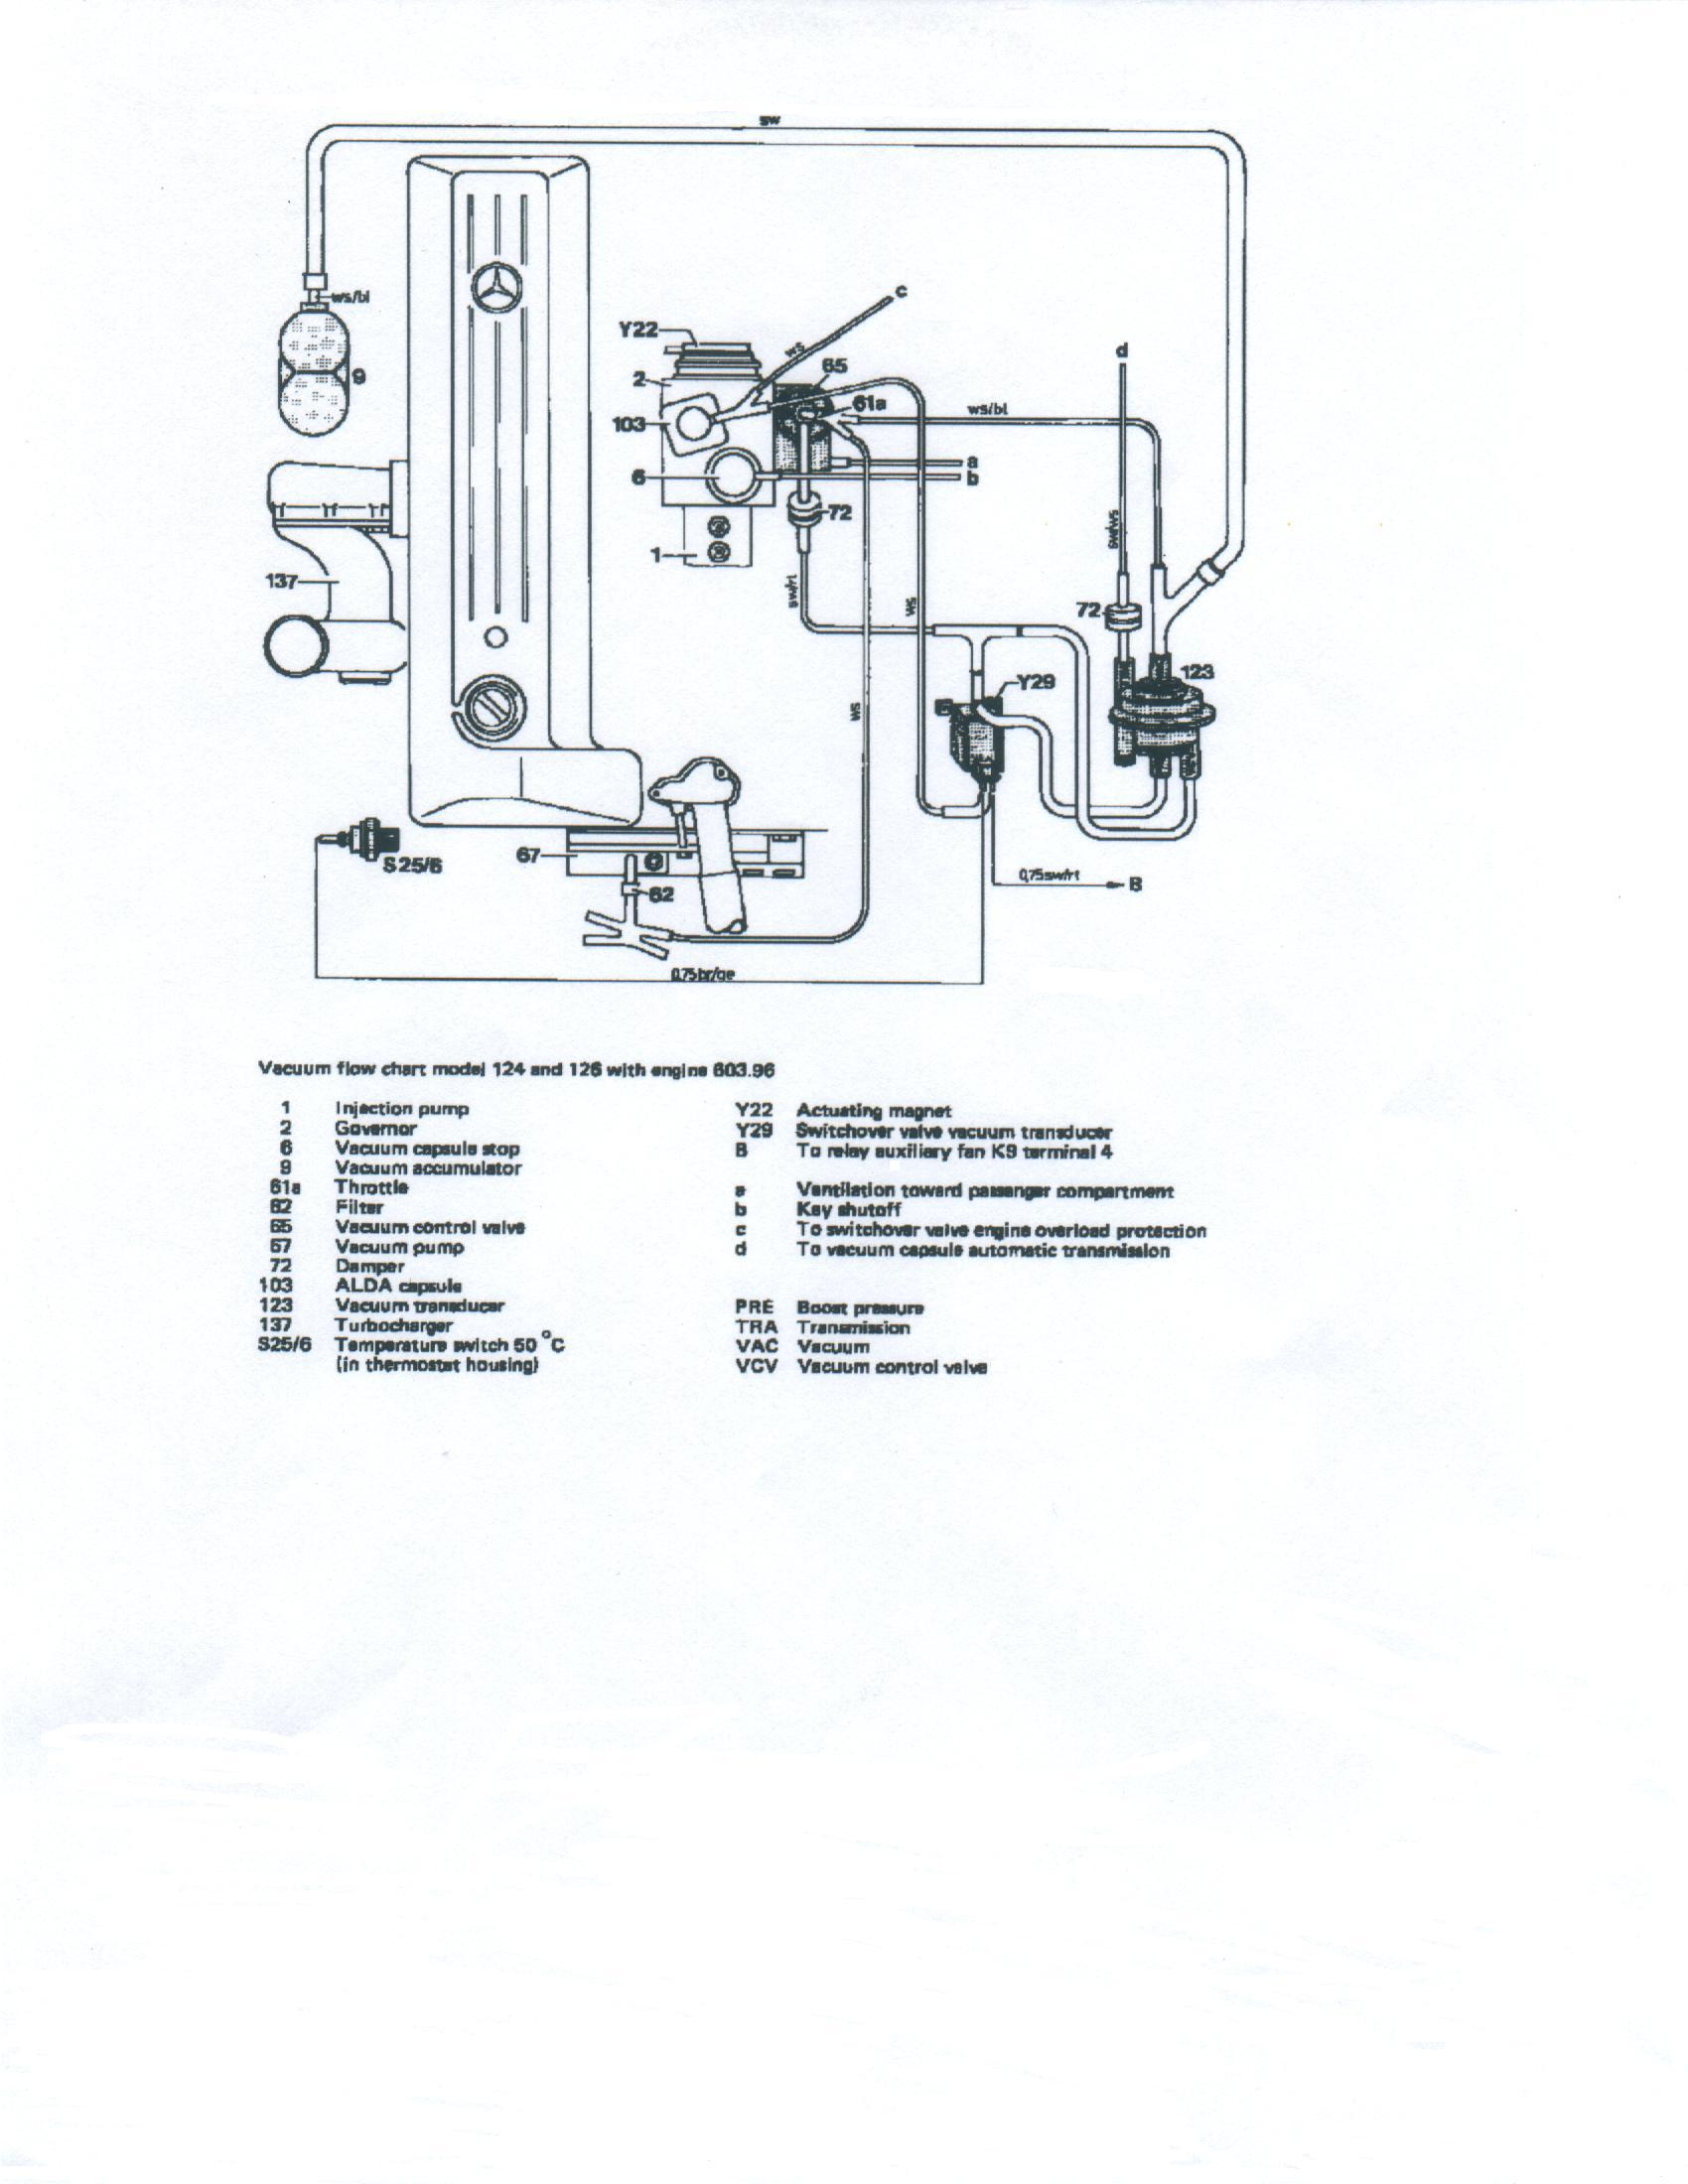 [DIAGRAM] Mercedes 560sec Wiring Diagram FULL Version HD